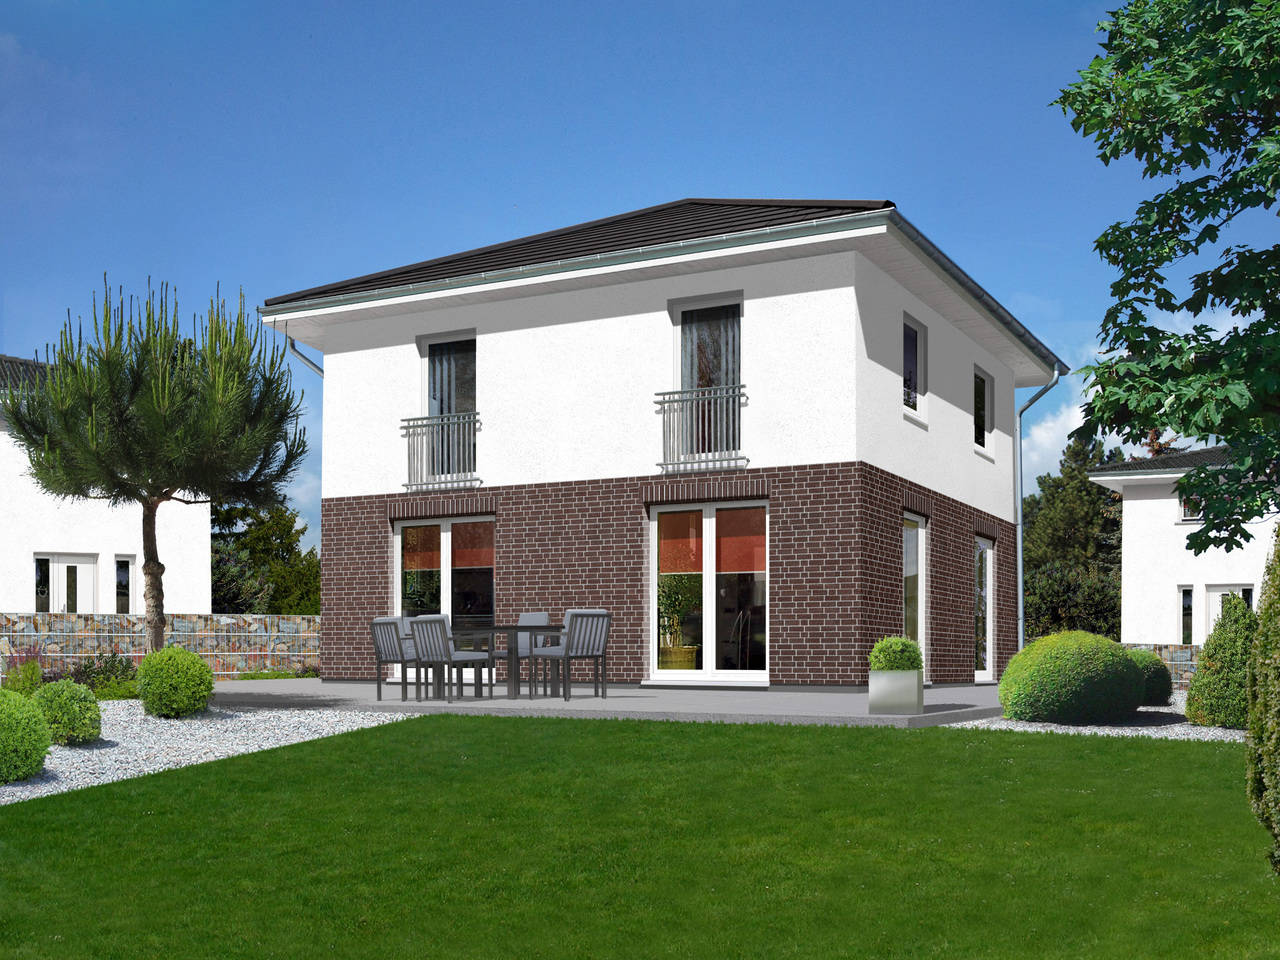 Stadthaus Flair 124 von ZuHause Bau GmbH - Town & Country